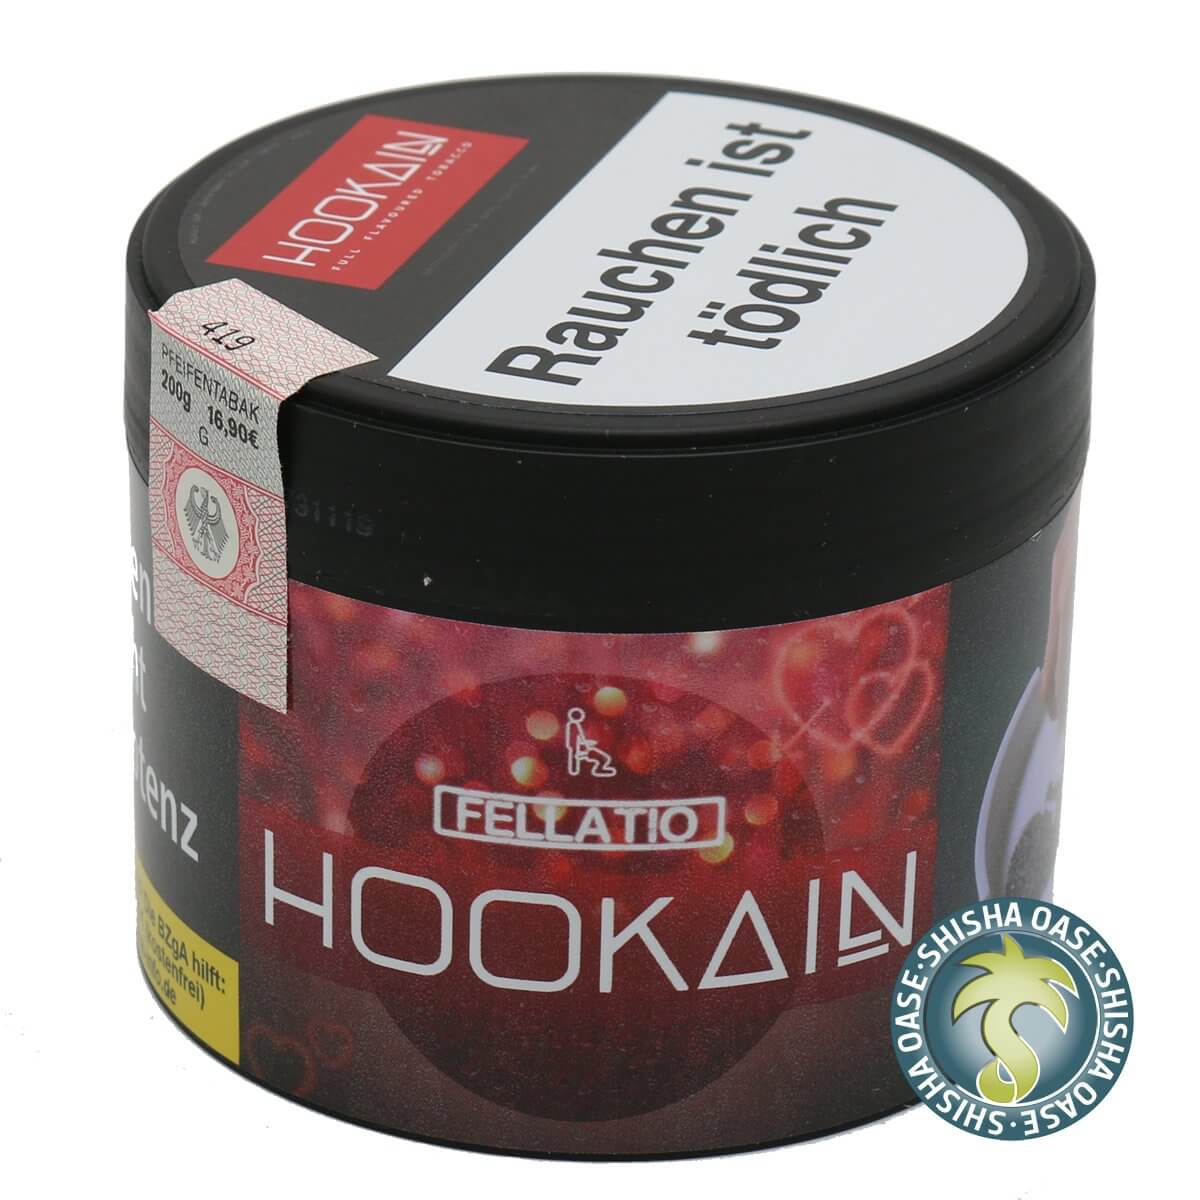 Hookain Tabak Fellatio 200g